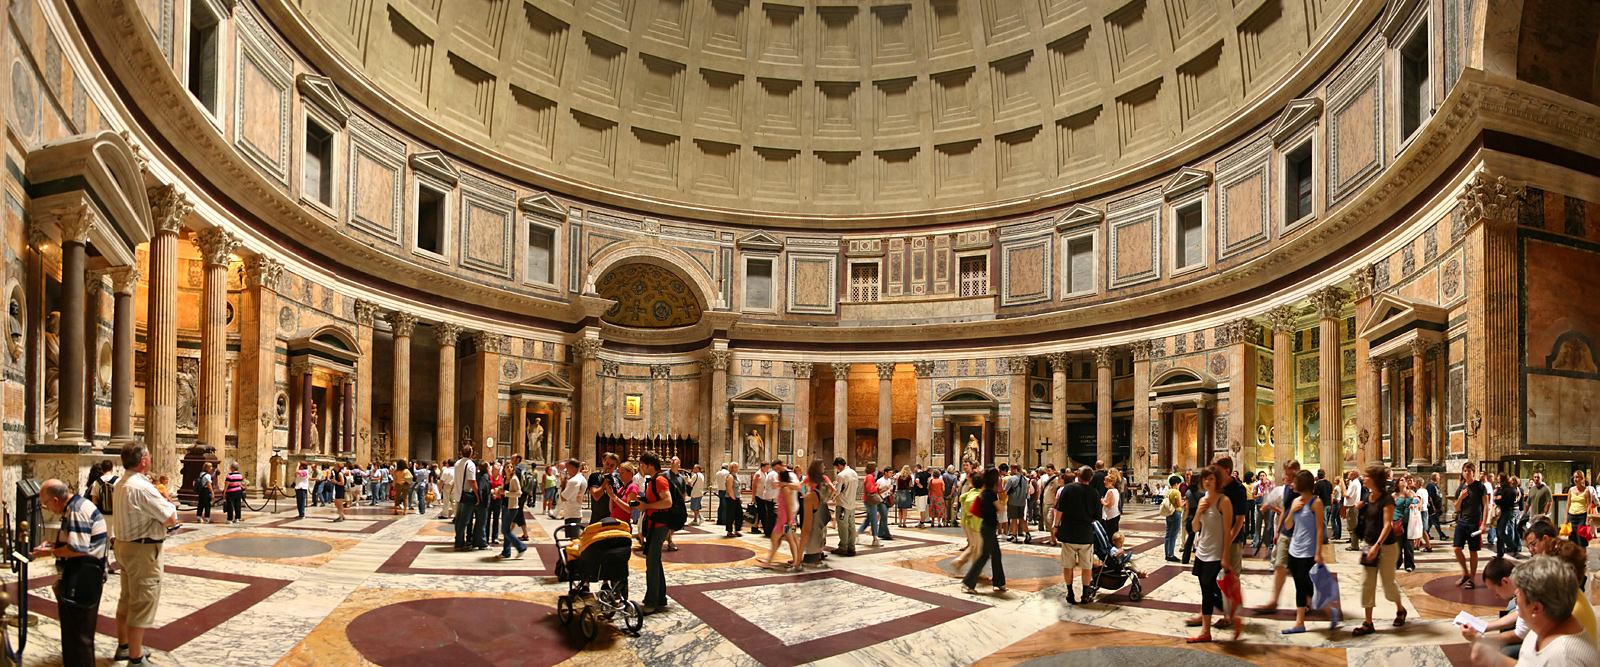 Pantheonul din Roma1